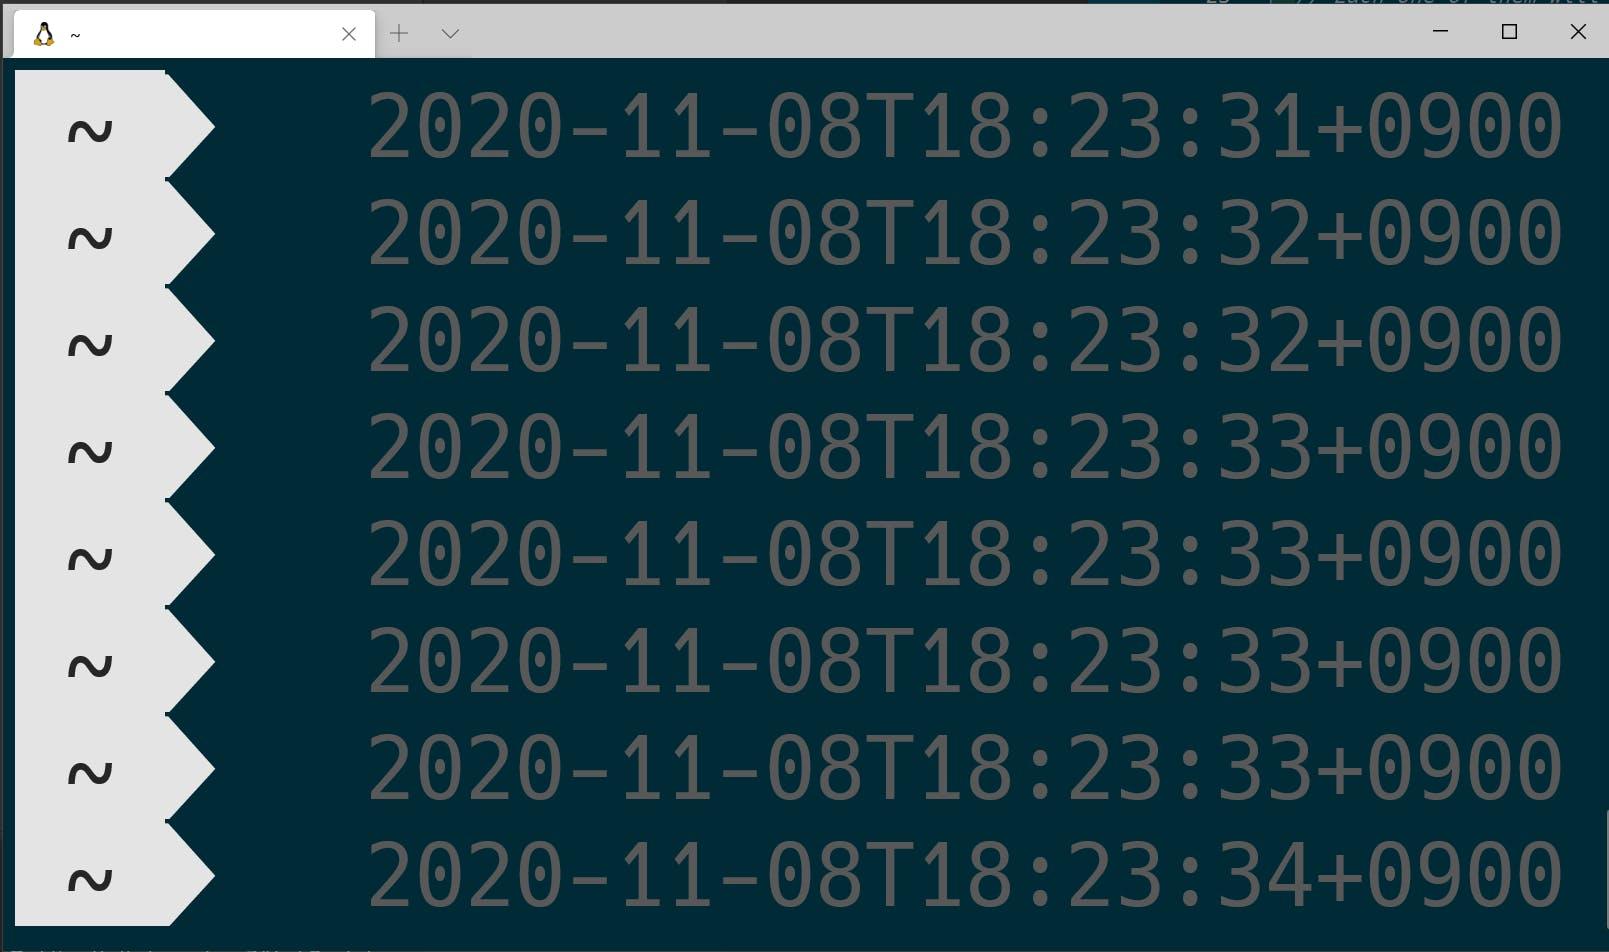 HackGenNerd_v2.2.1.png